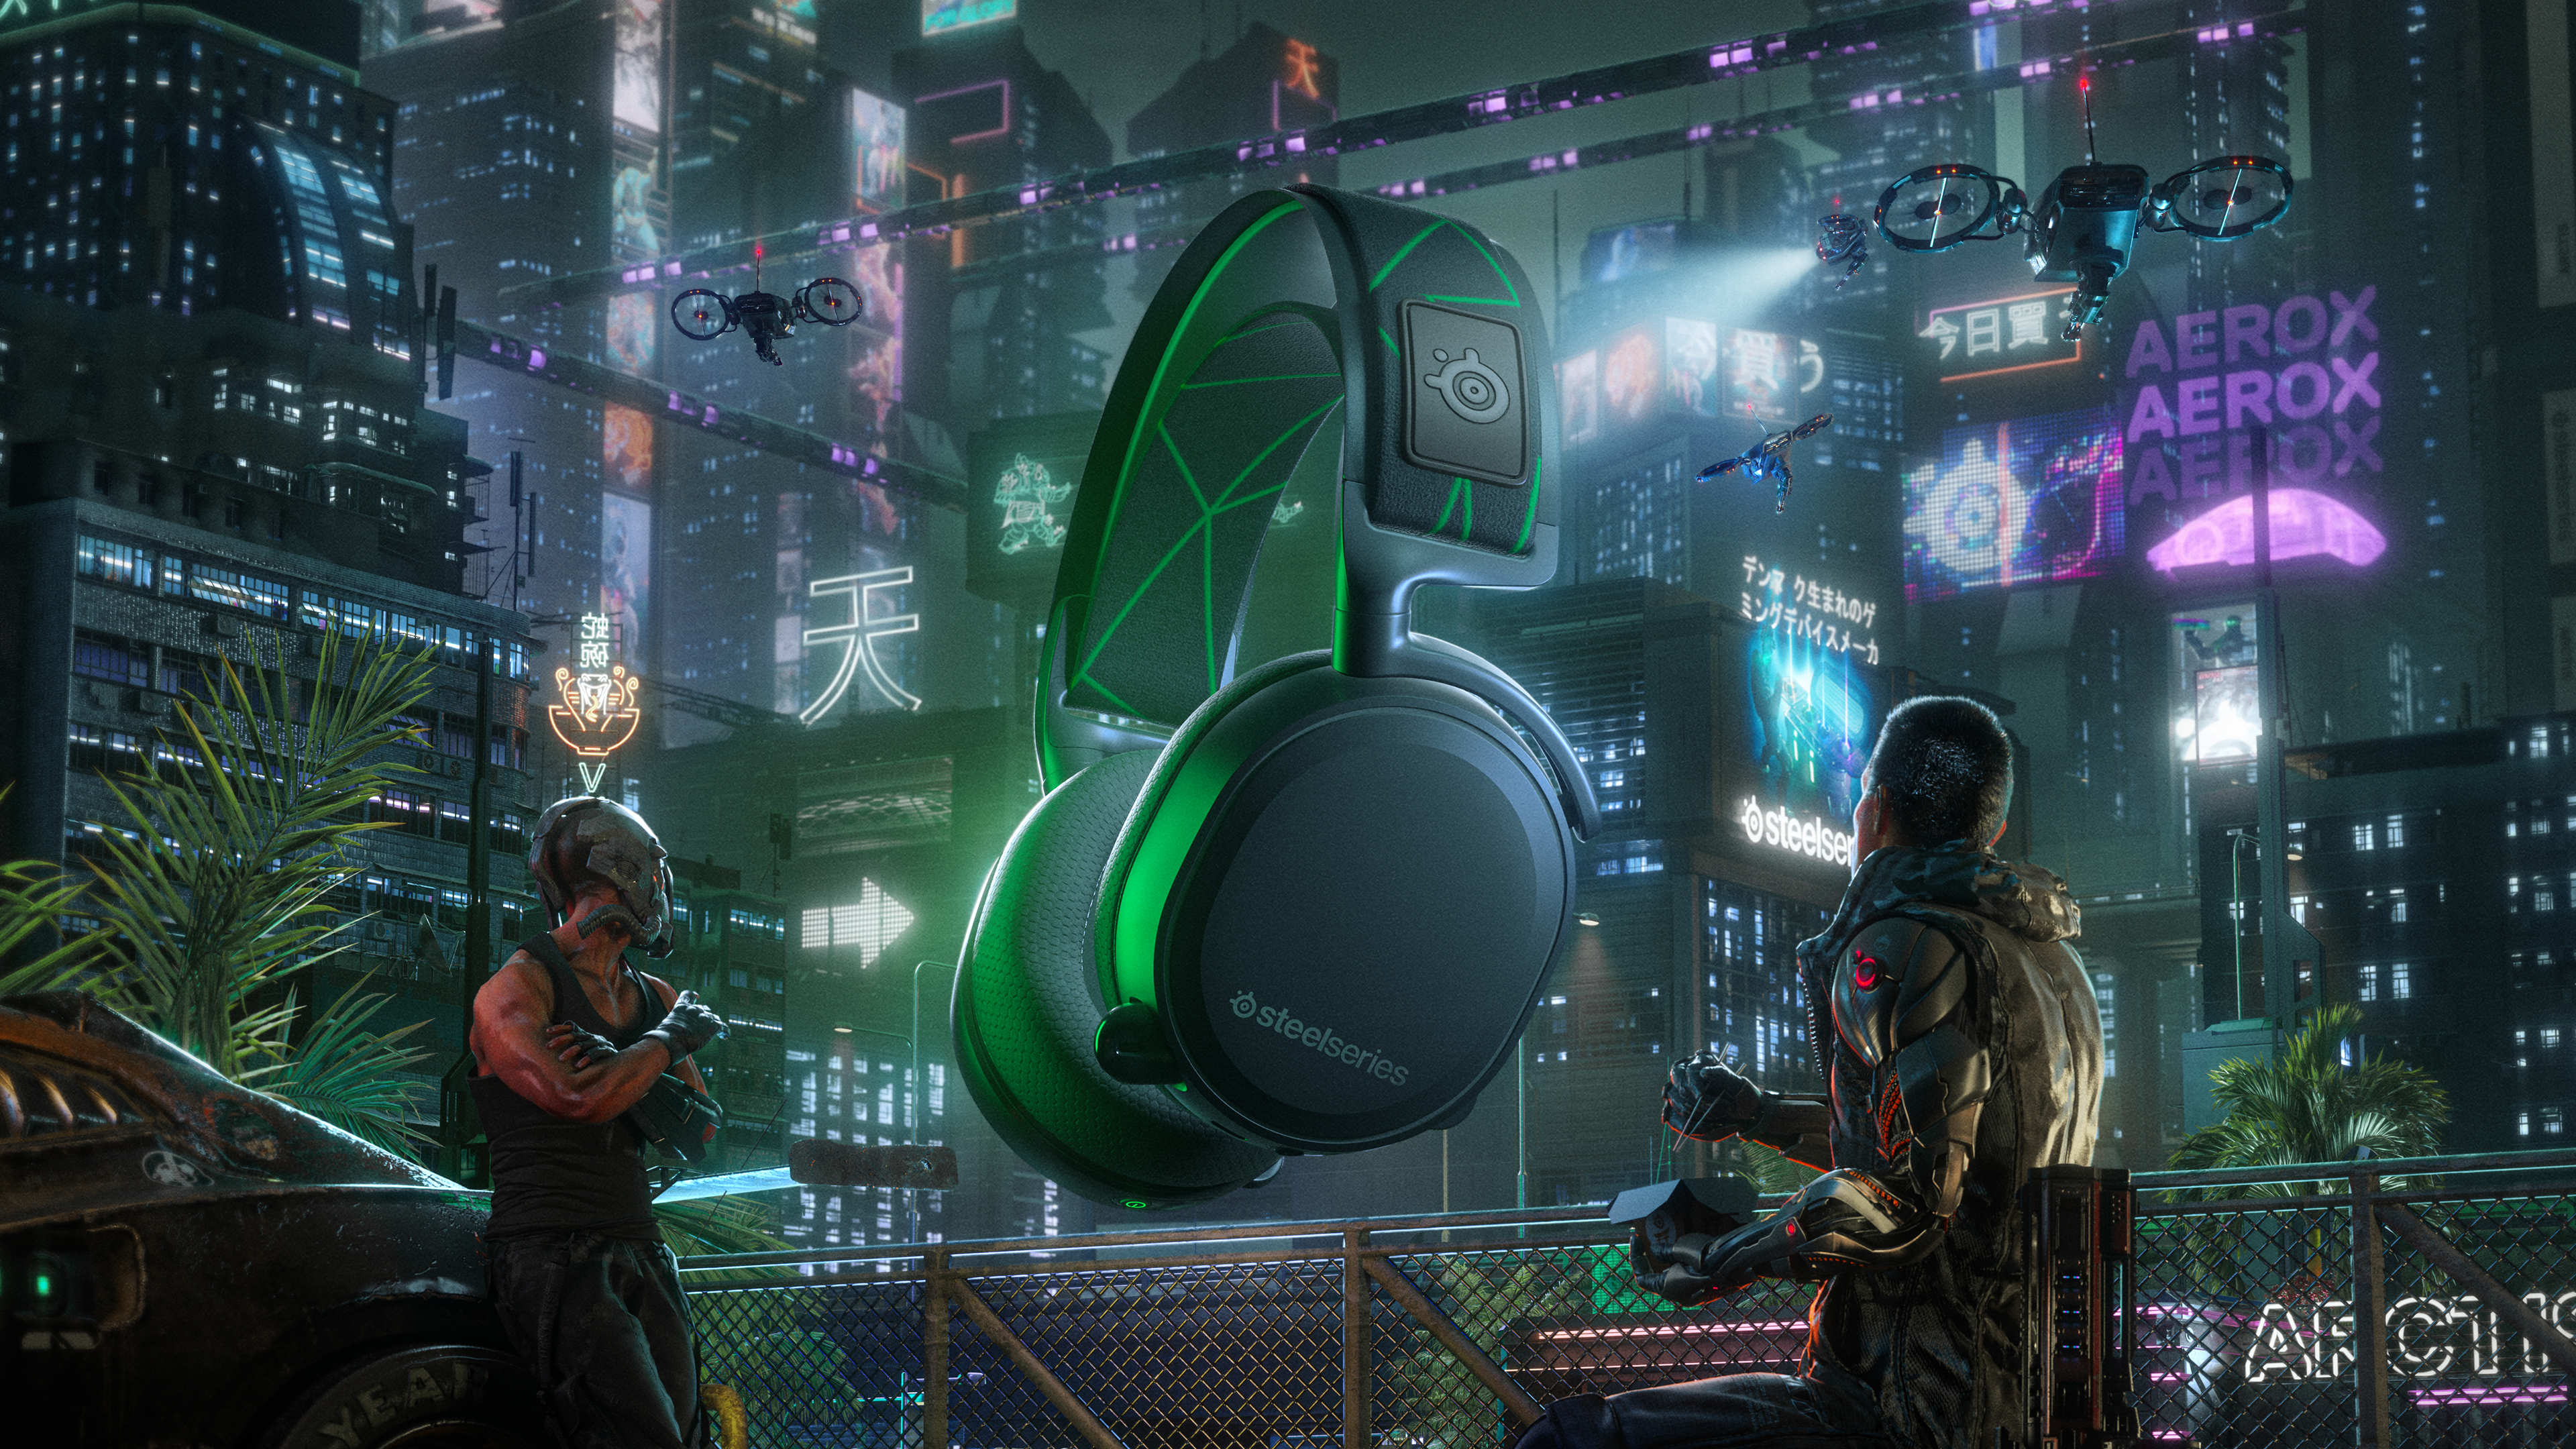 Cyberpunk night